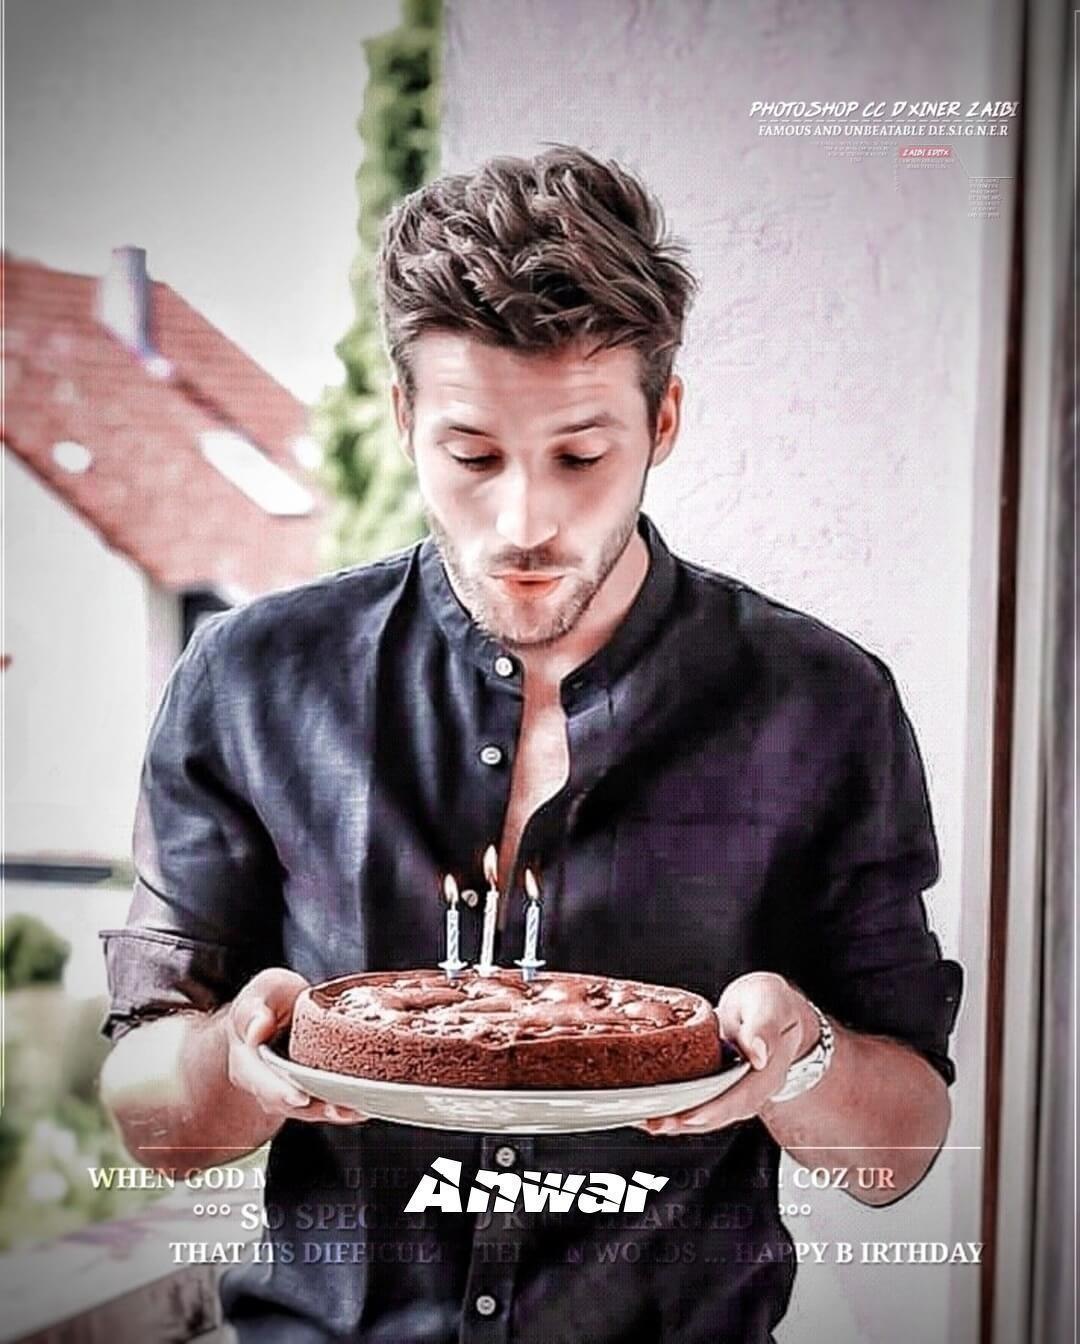 Happy Birthday Boy Cake With Name Anwar